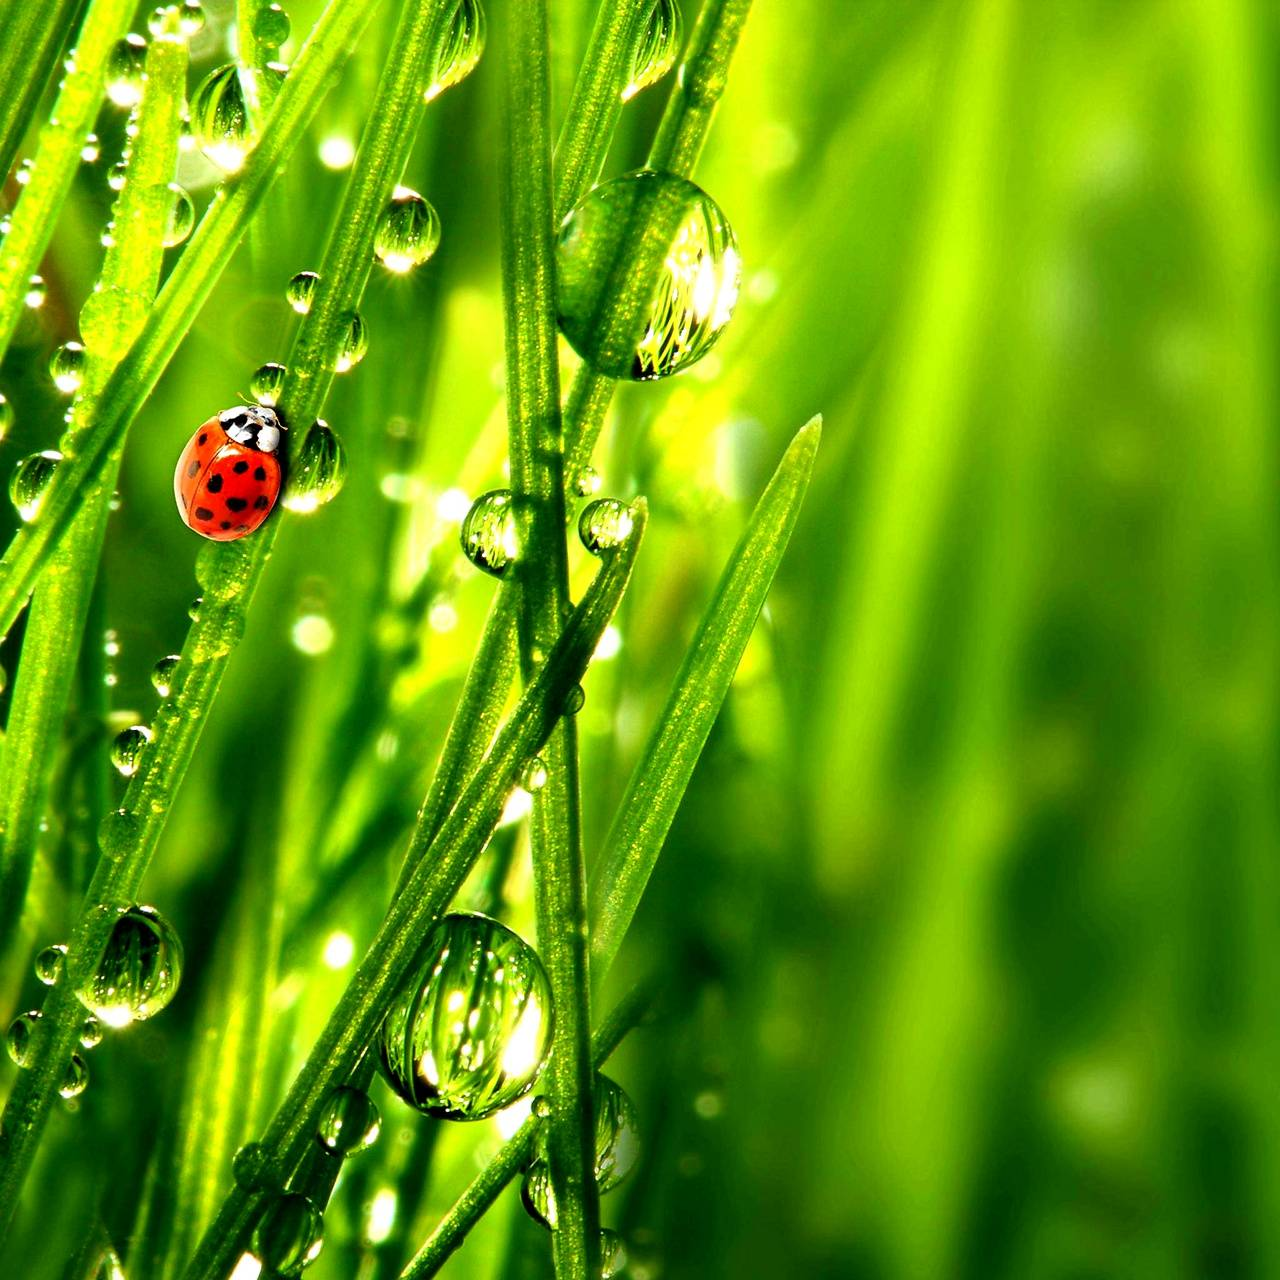 Ladybug Dewdrops